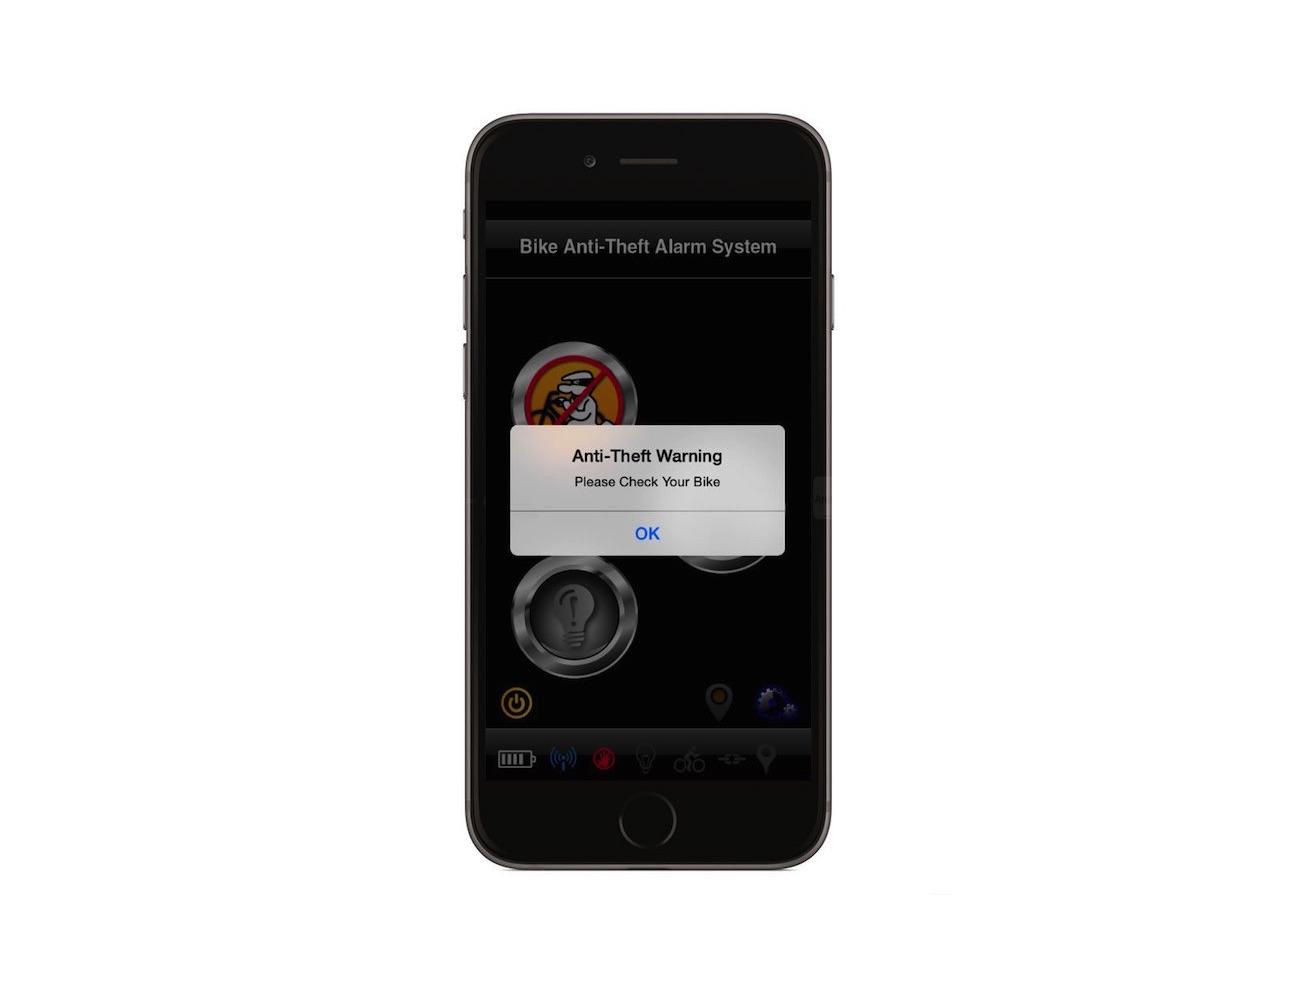 Smartphone Alerting Bike Alarm